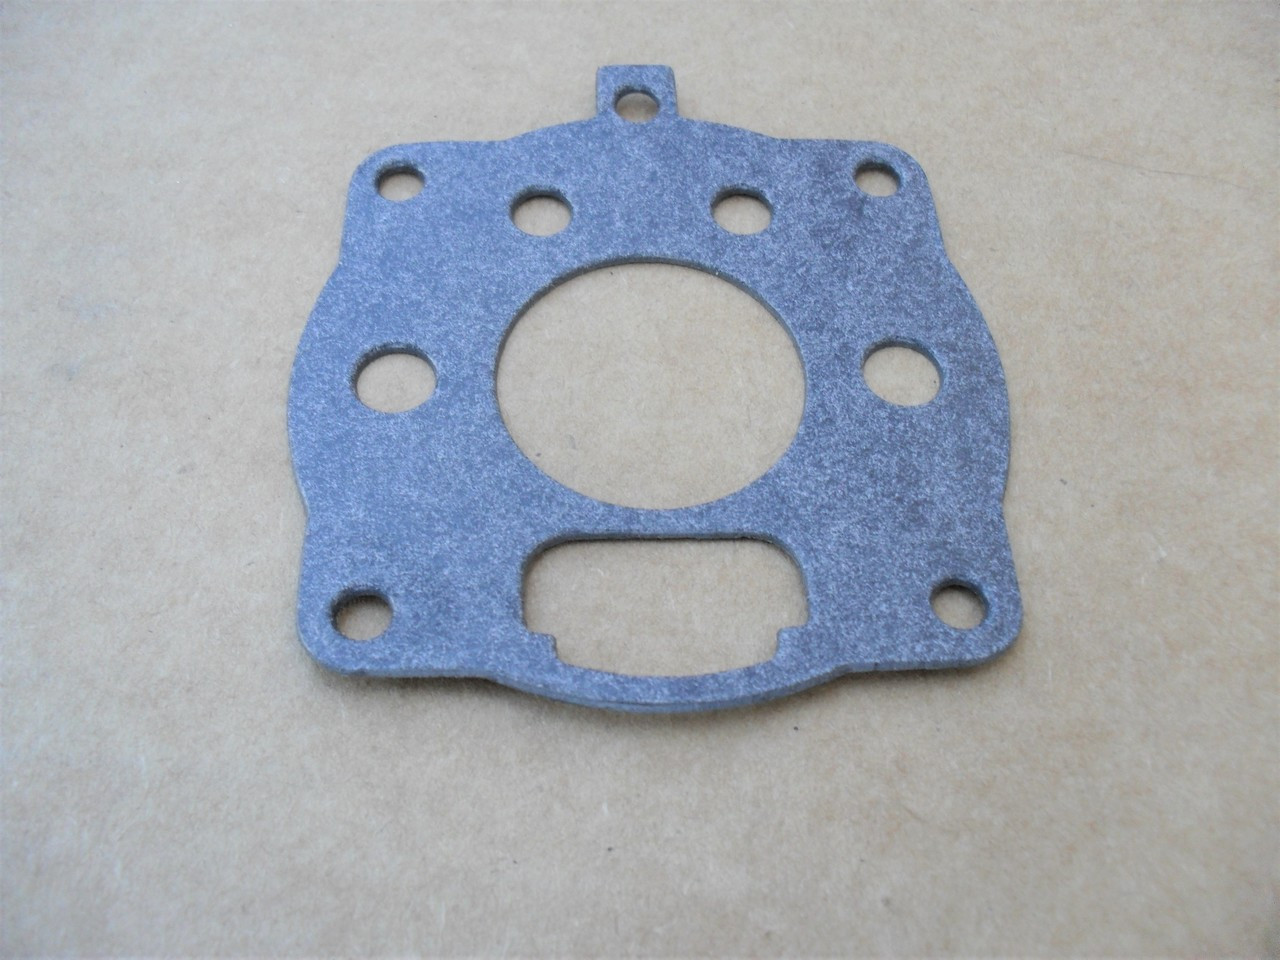 Replaces Briggs /& Stratton 692215 Stens 485-359 Carburetor Body Gasket